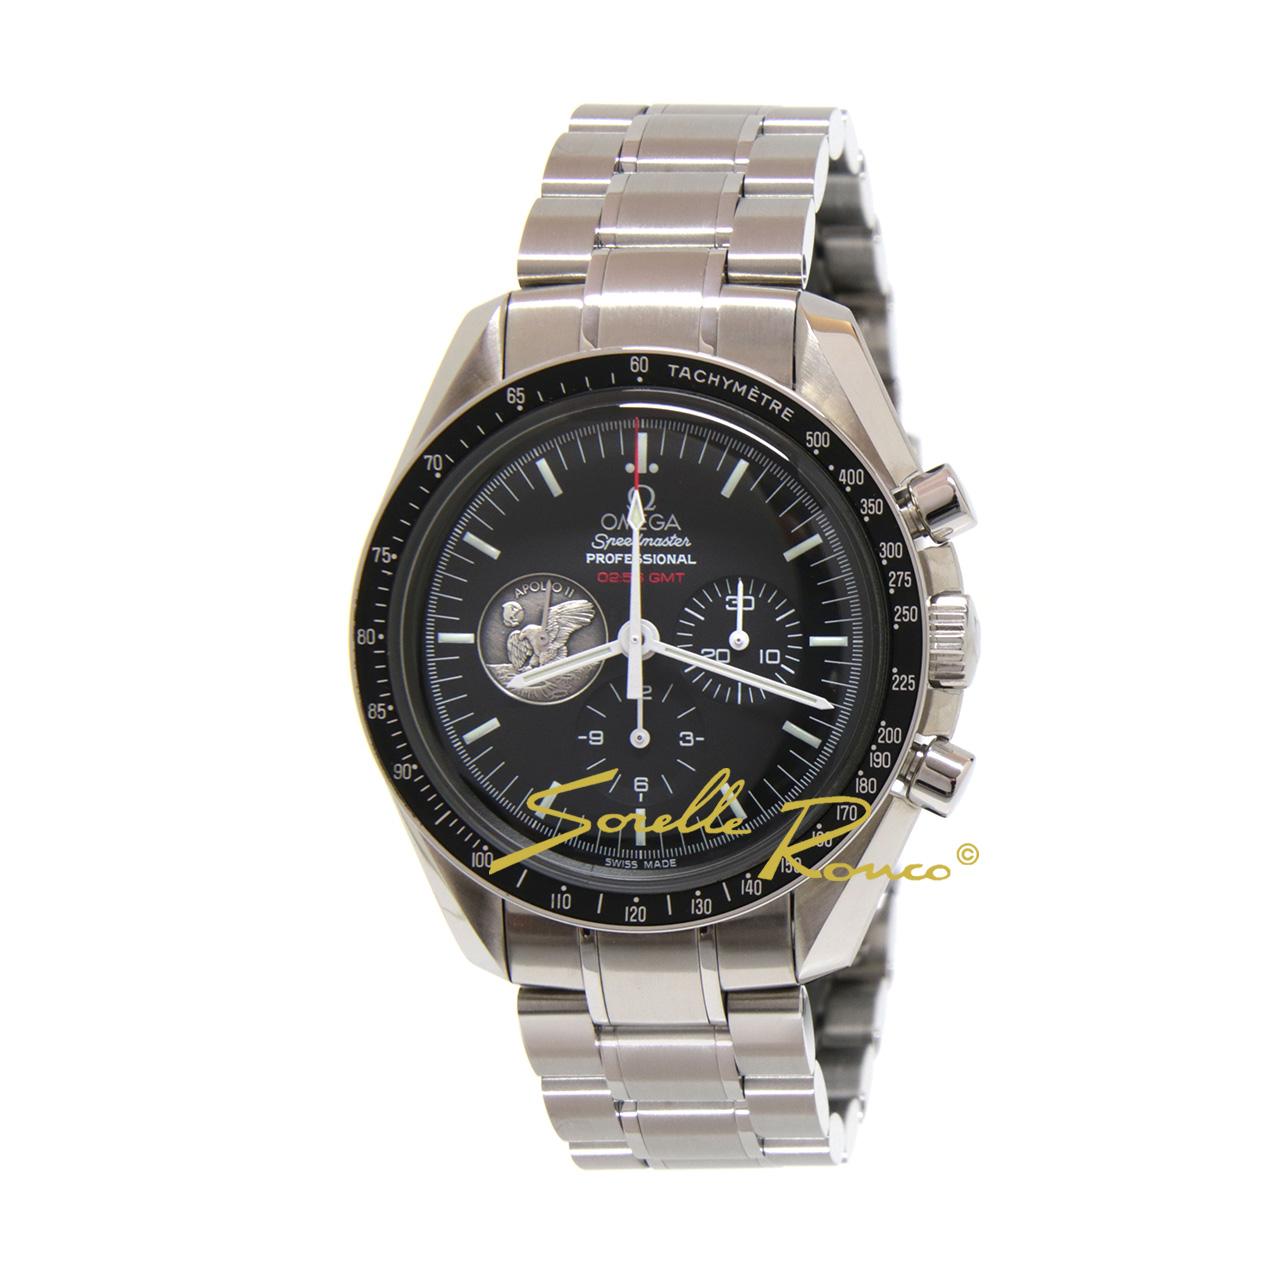 Speedmaster Apollo 11 40° Anniversario Limited Edition